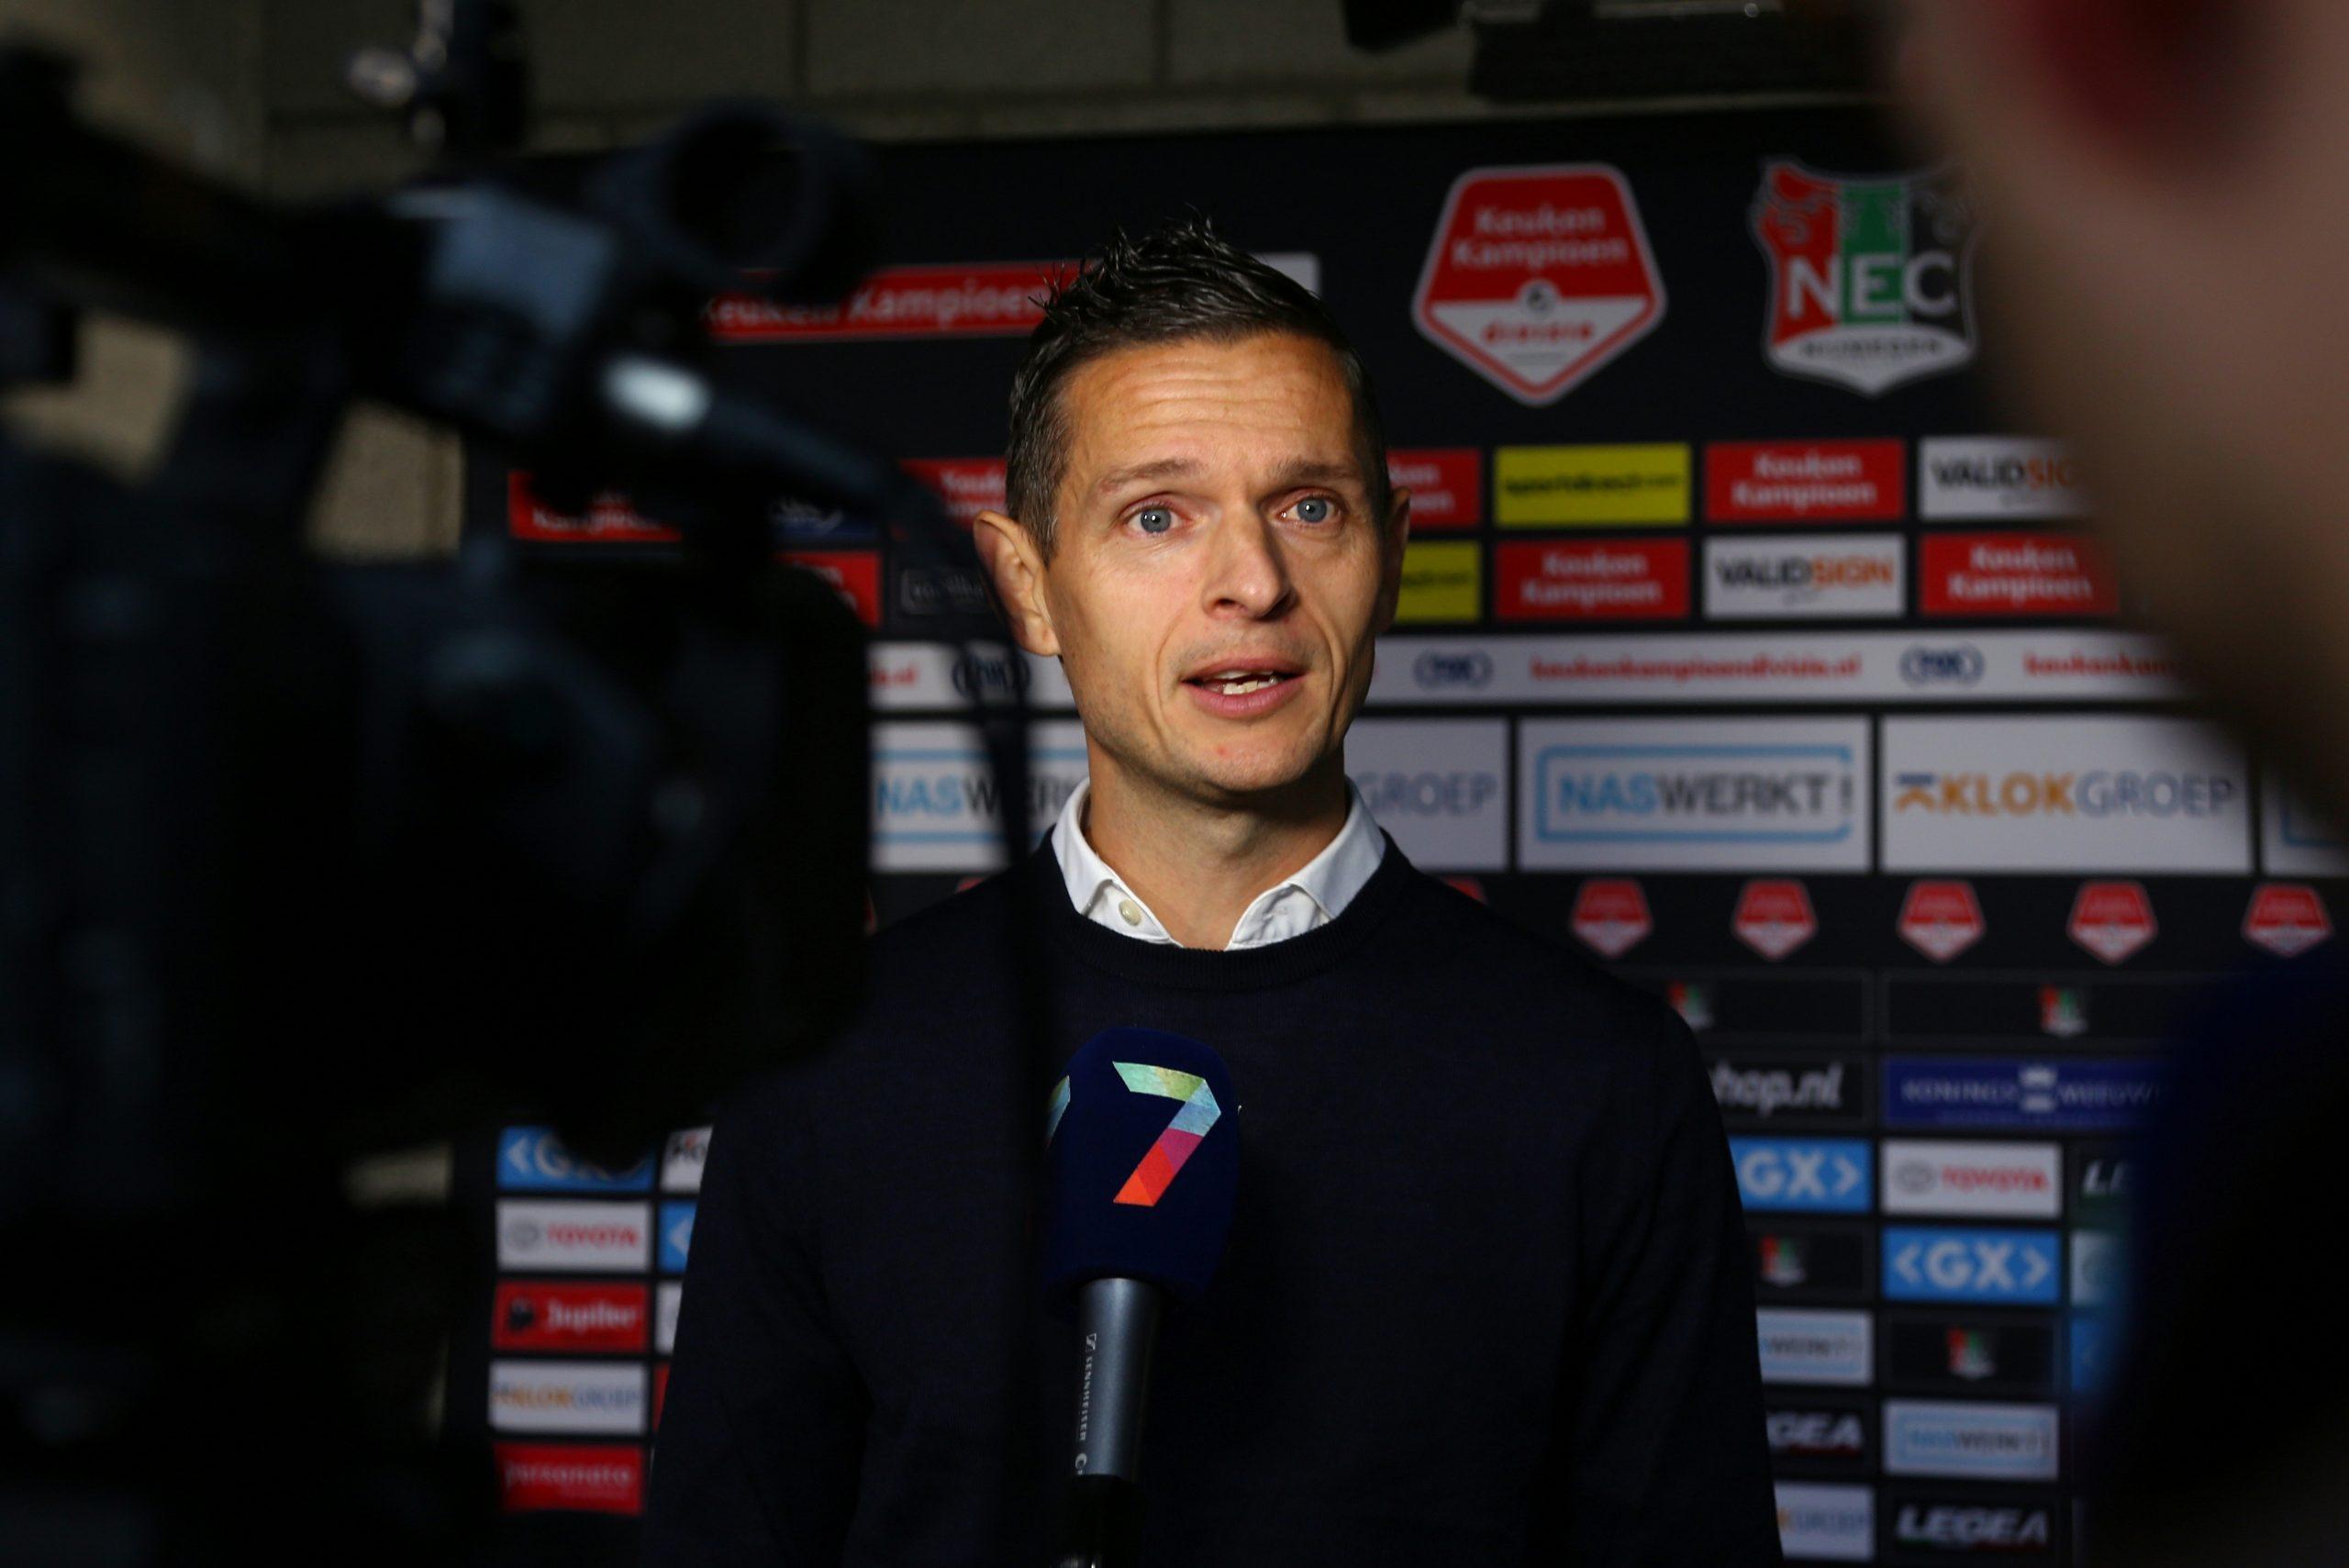 Meijer is tevreden met loting en wil kloof slaan met FC Eindhoven